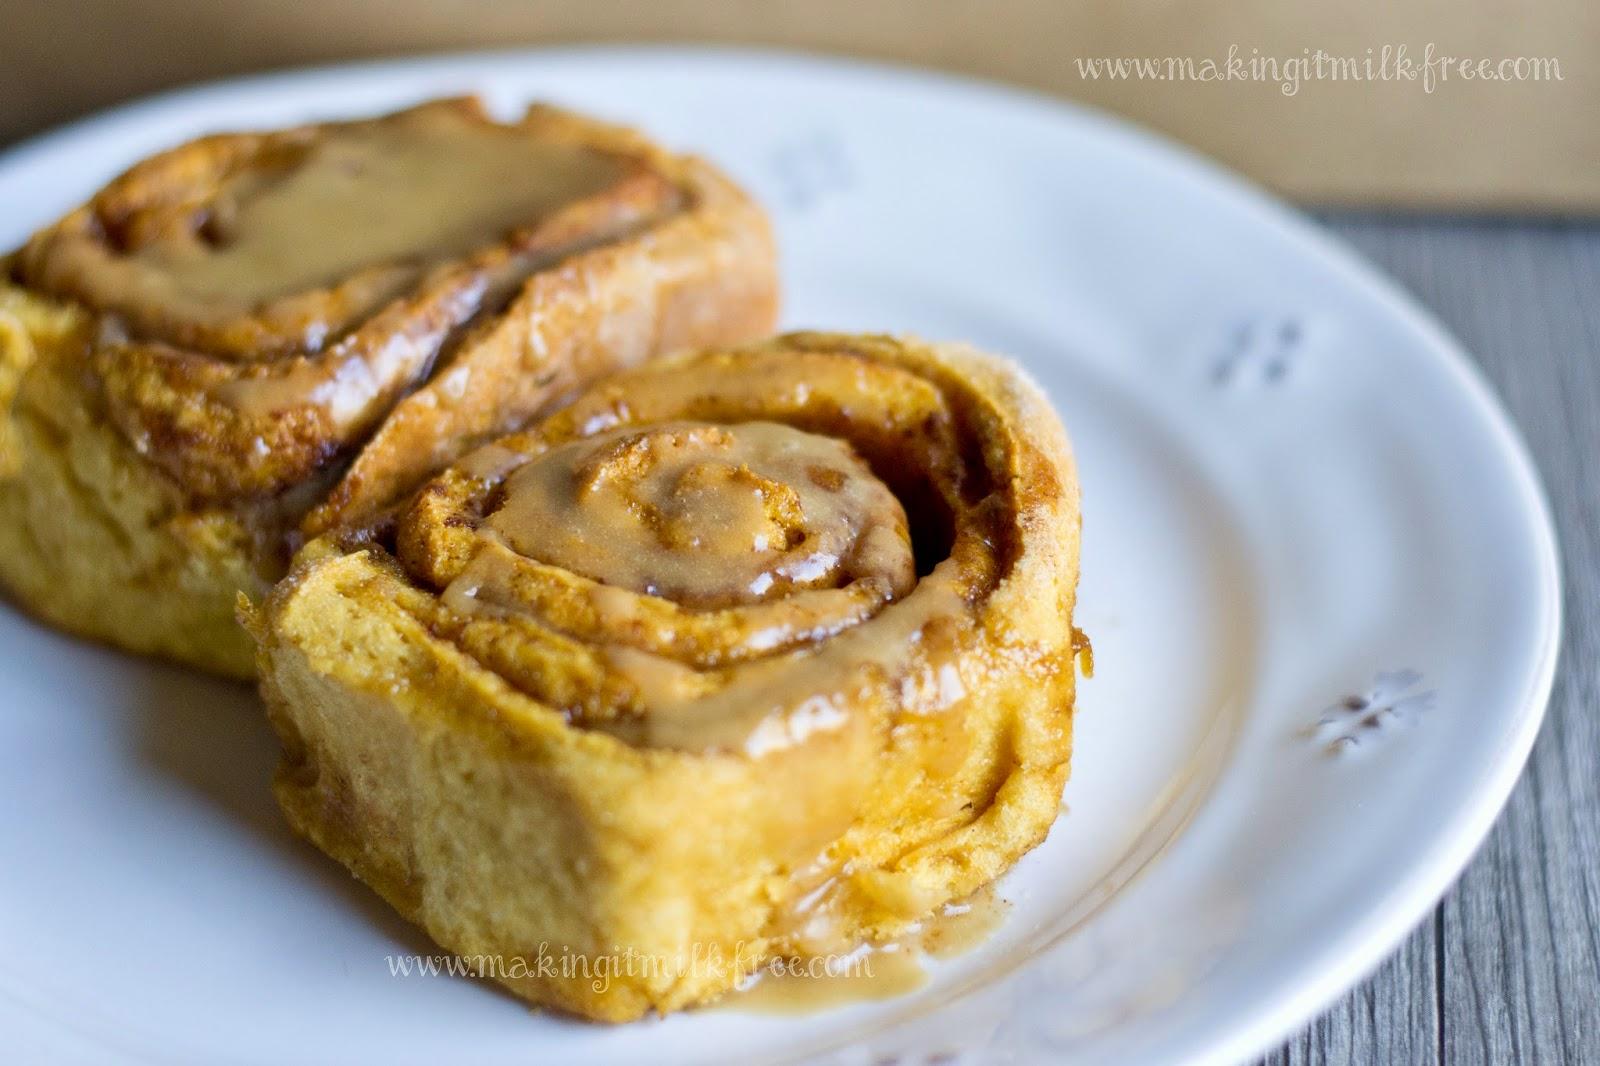 #glutenfree #vegan #cinnamonrolls